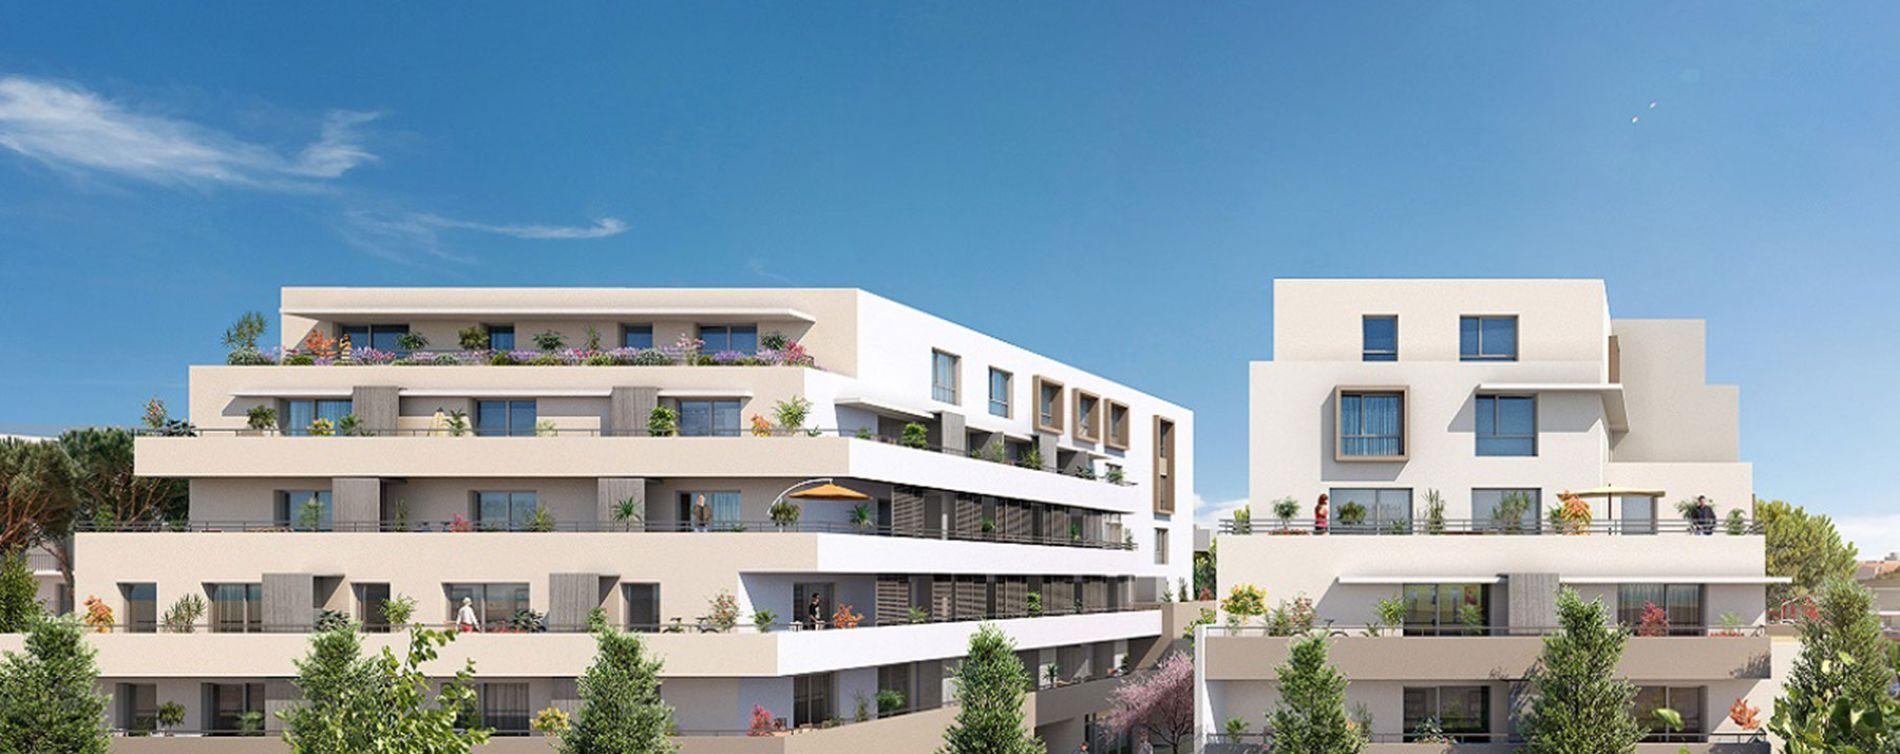 Résidence Fac'Story à Montpellier